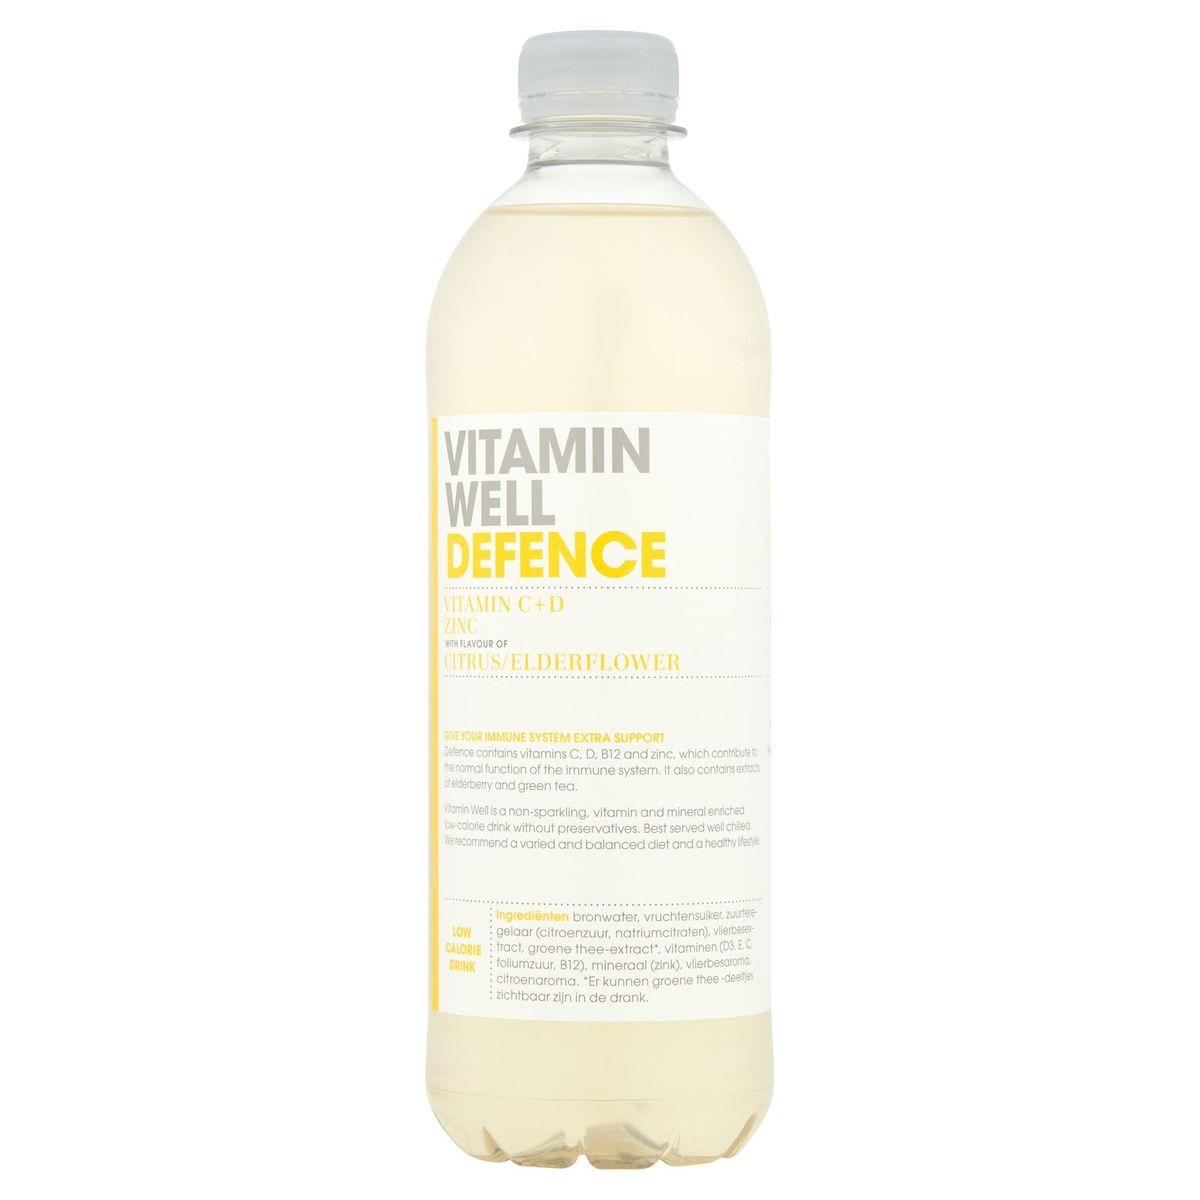 Vitamin Well Defence Vitamin C+D Zinc Citrus/Elderflower 500 ml